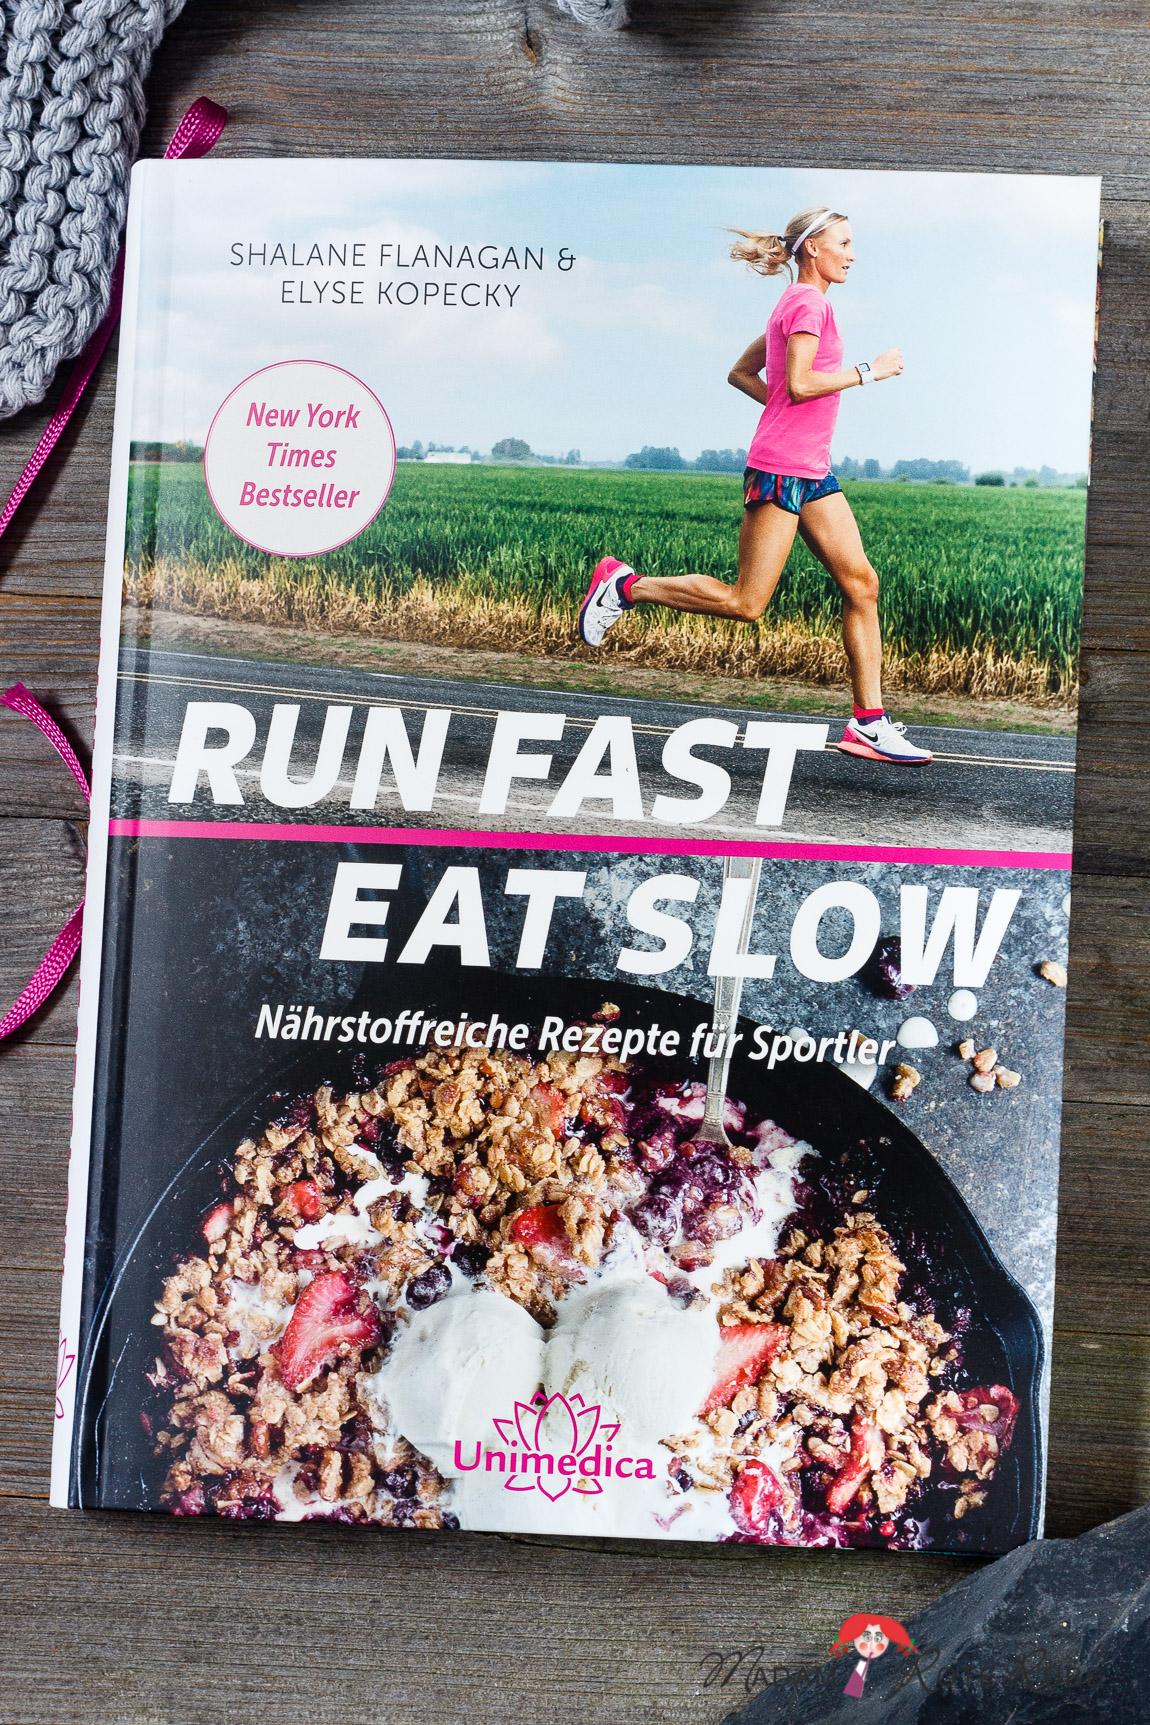 Kochbuch-Vorstellungen: Run Fast Eat Slow